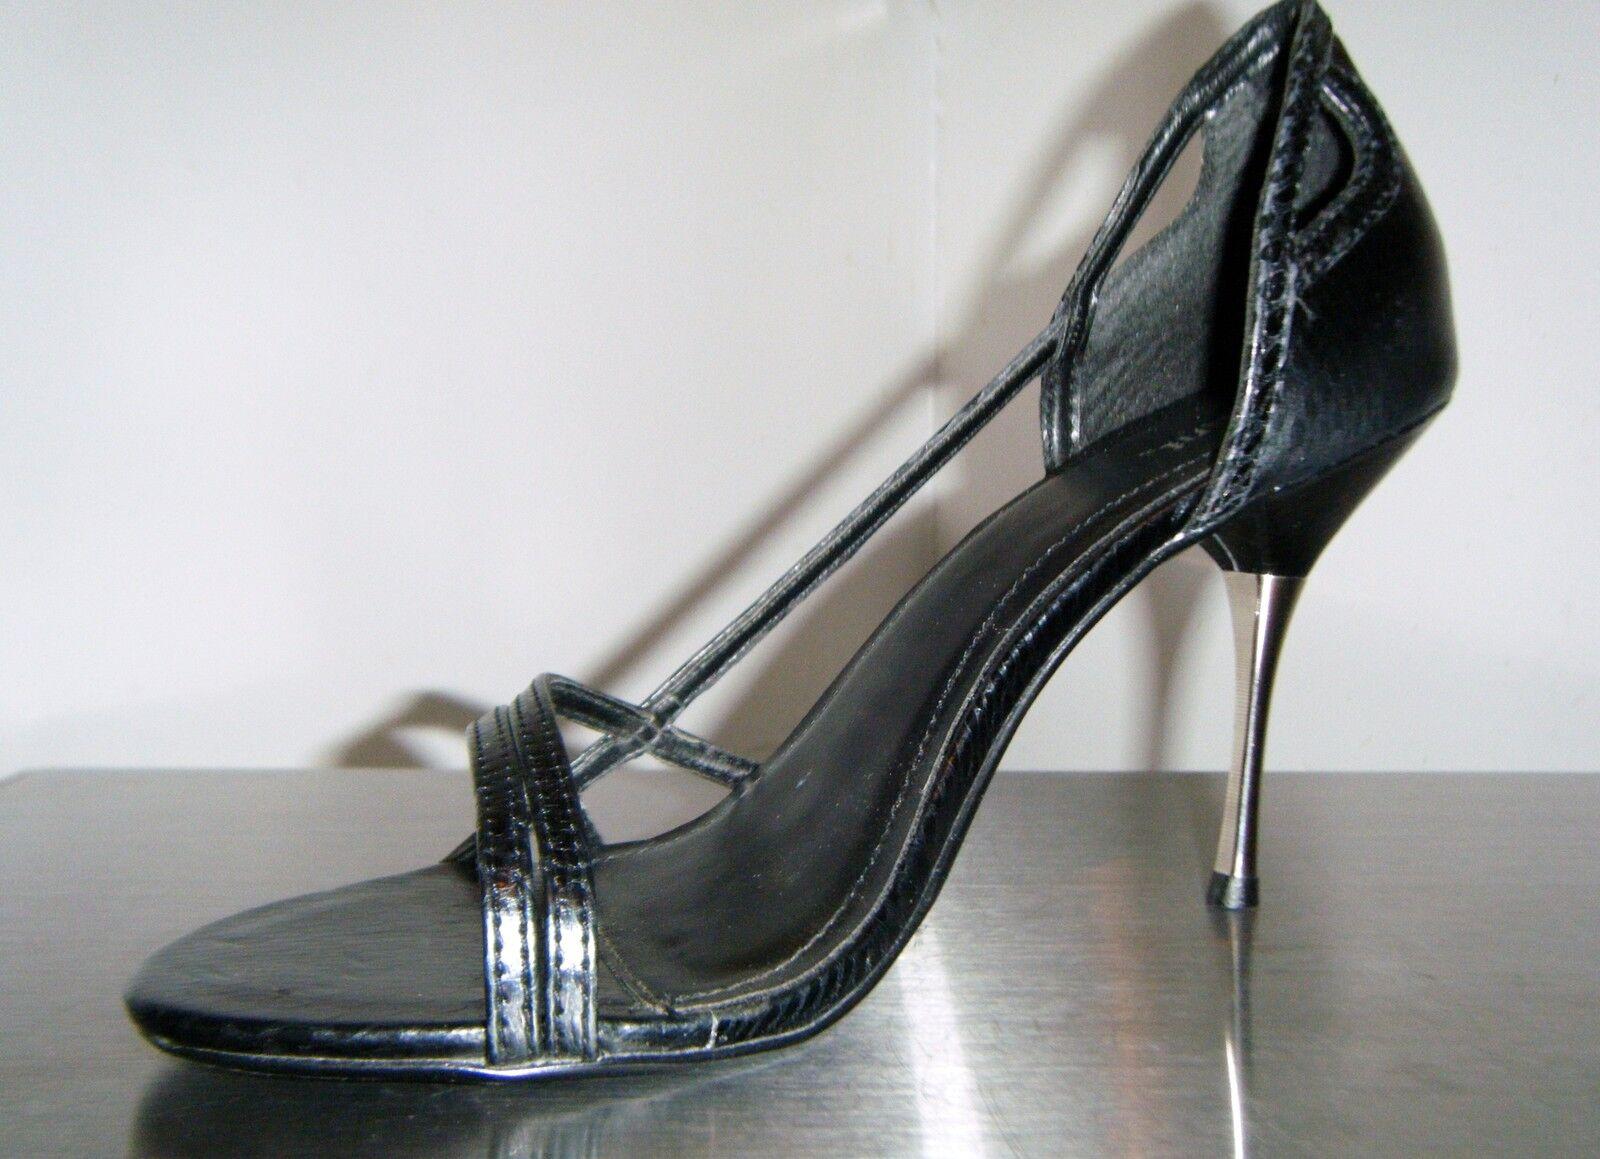 TAUNT SPLASH Heels Women's Black Snake Metallic Heels SPLASH Slingbacks Strappy Pumps sz. 7 8406ef